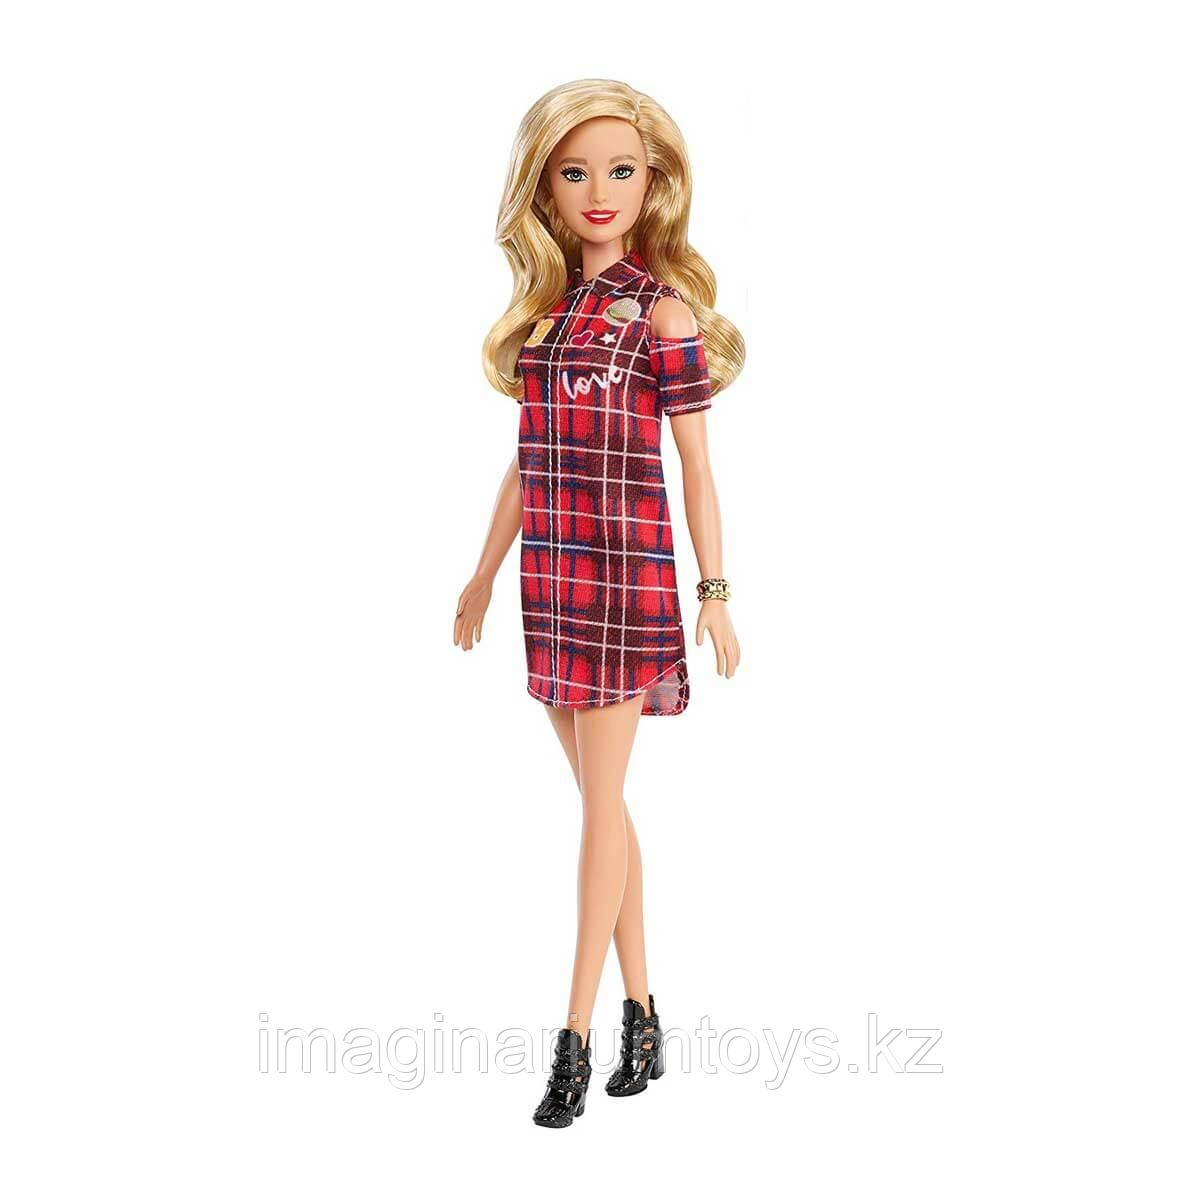 Кукла Барби модница блондинка #113